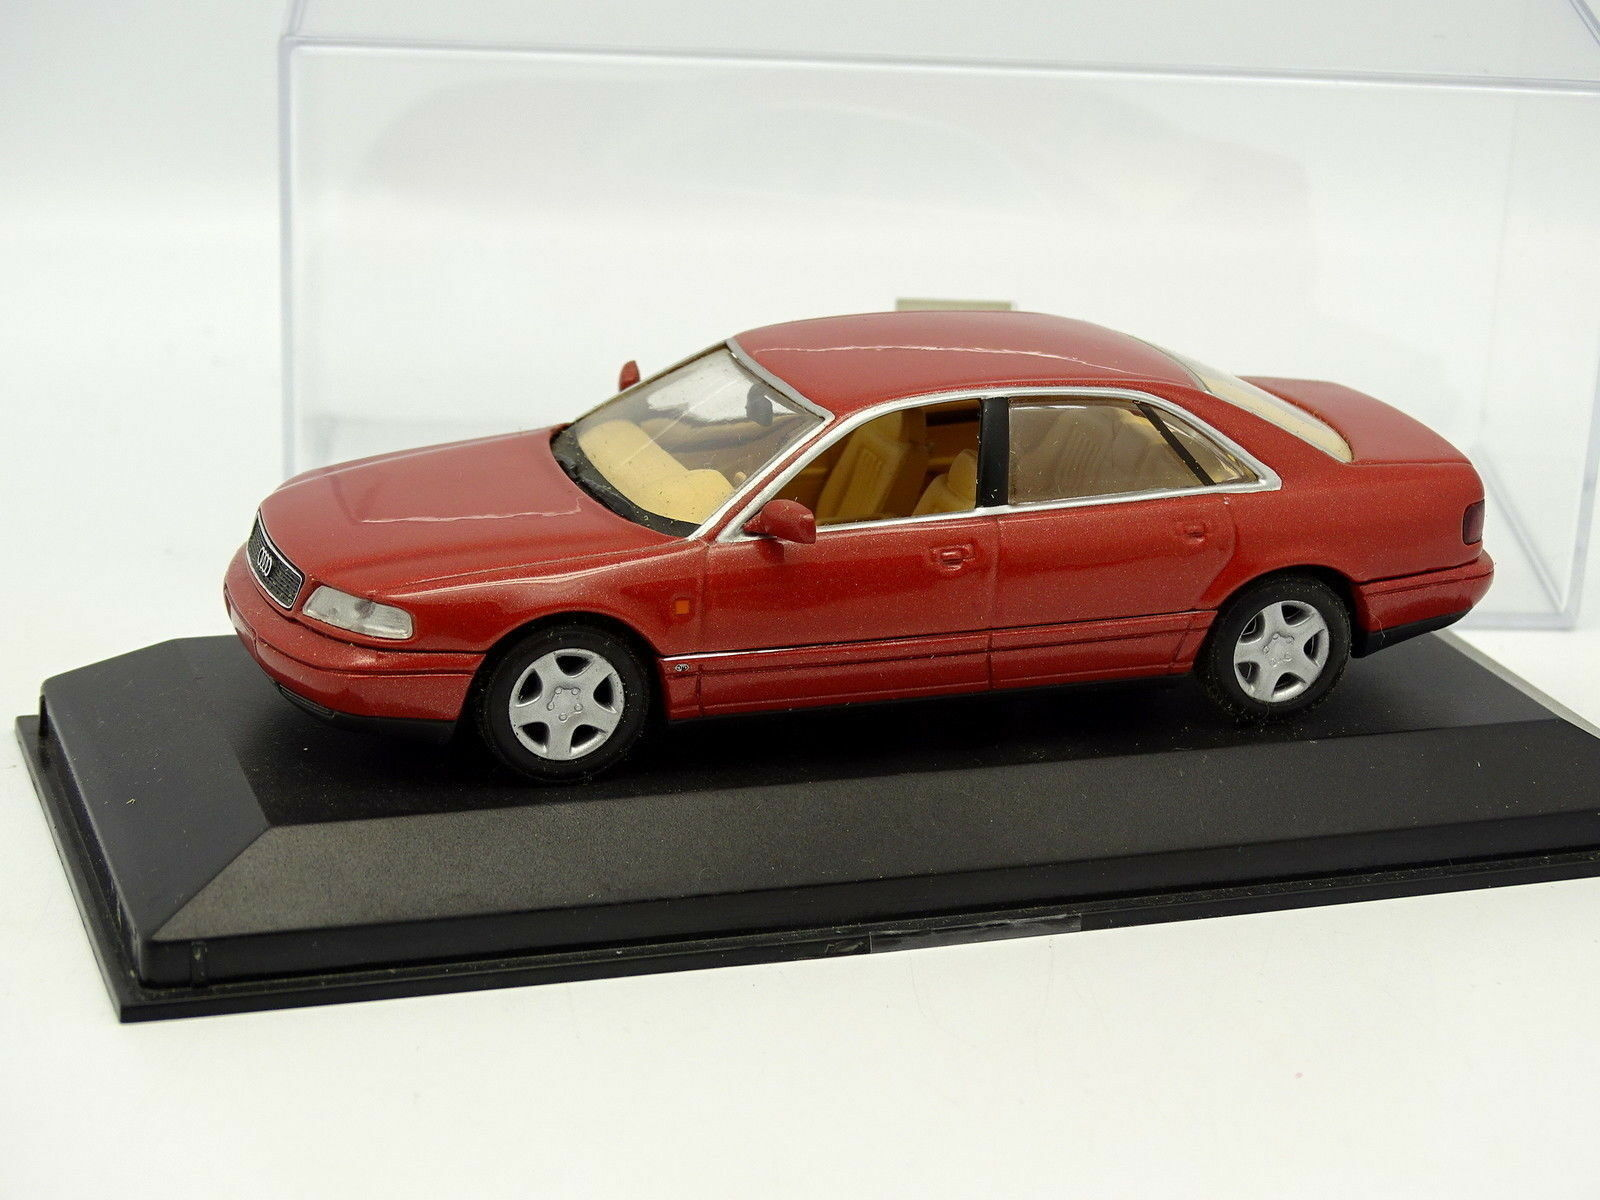 Minichamps 1 43 - Audi A8 red orange